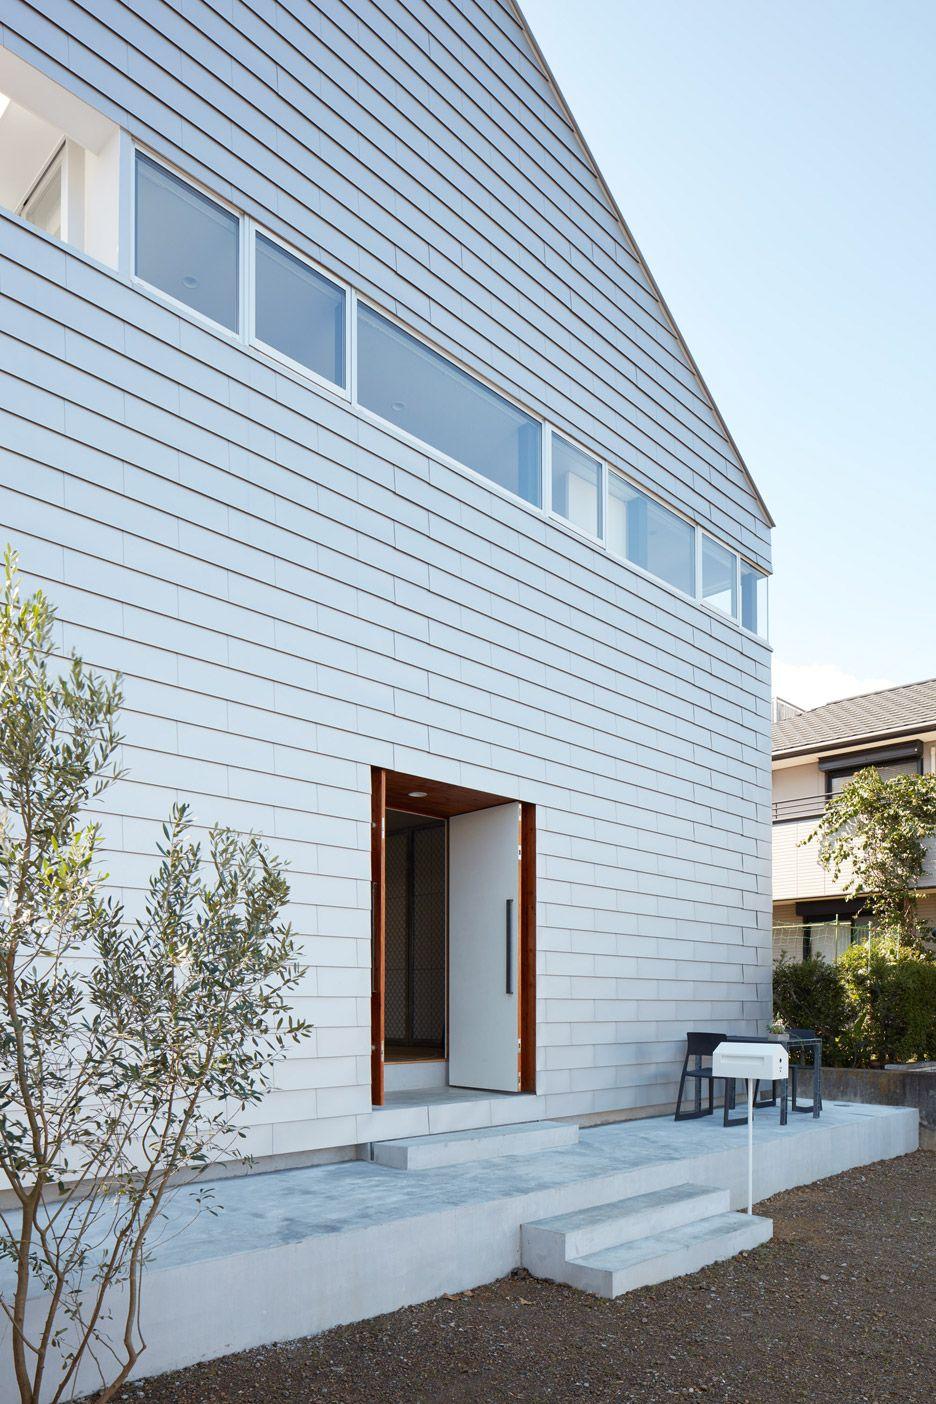 Basketball Court House by Koizumi Sekkei 建築デザイン, 家, ホームインテリア